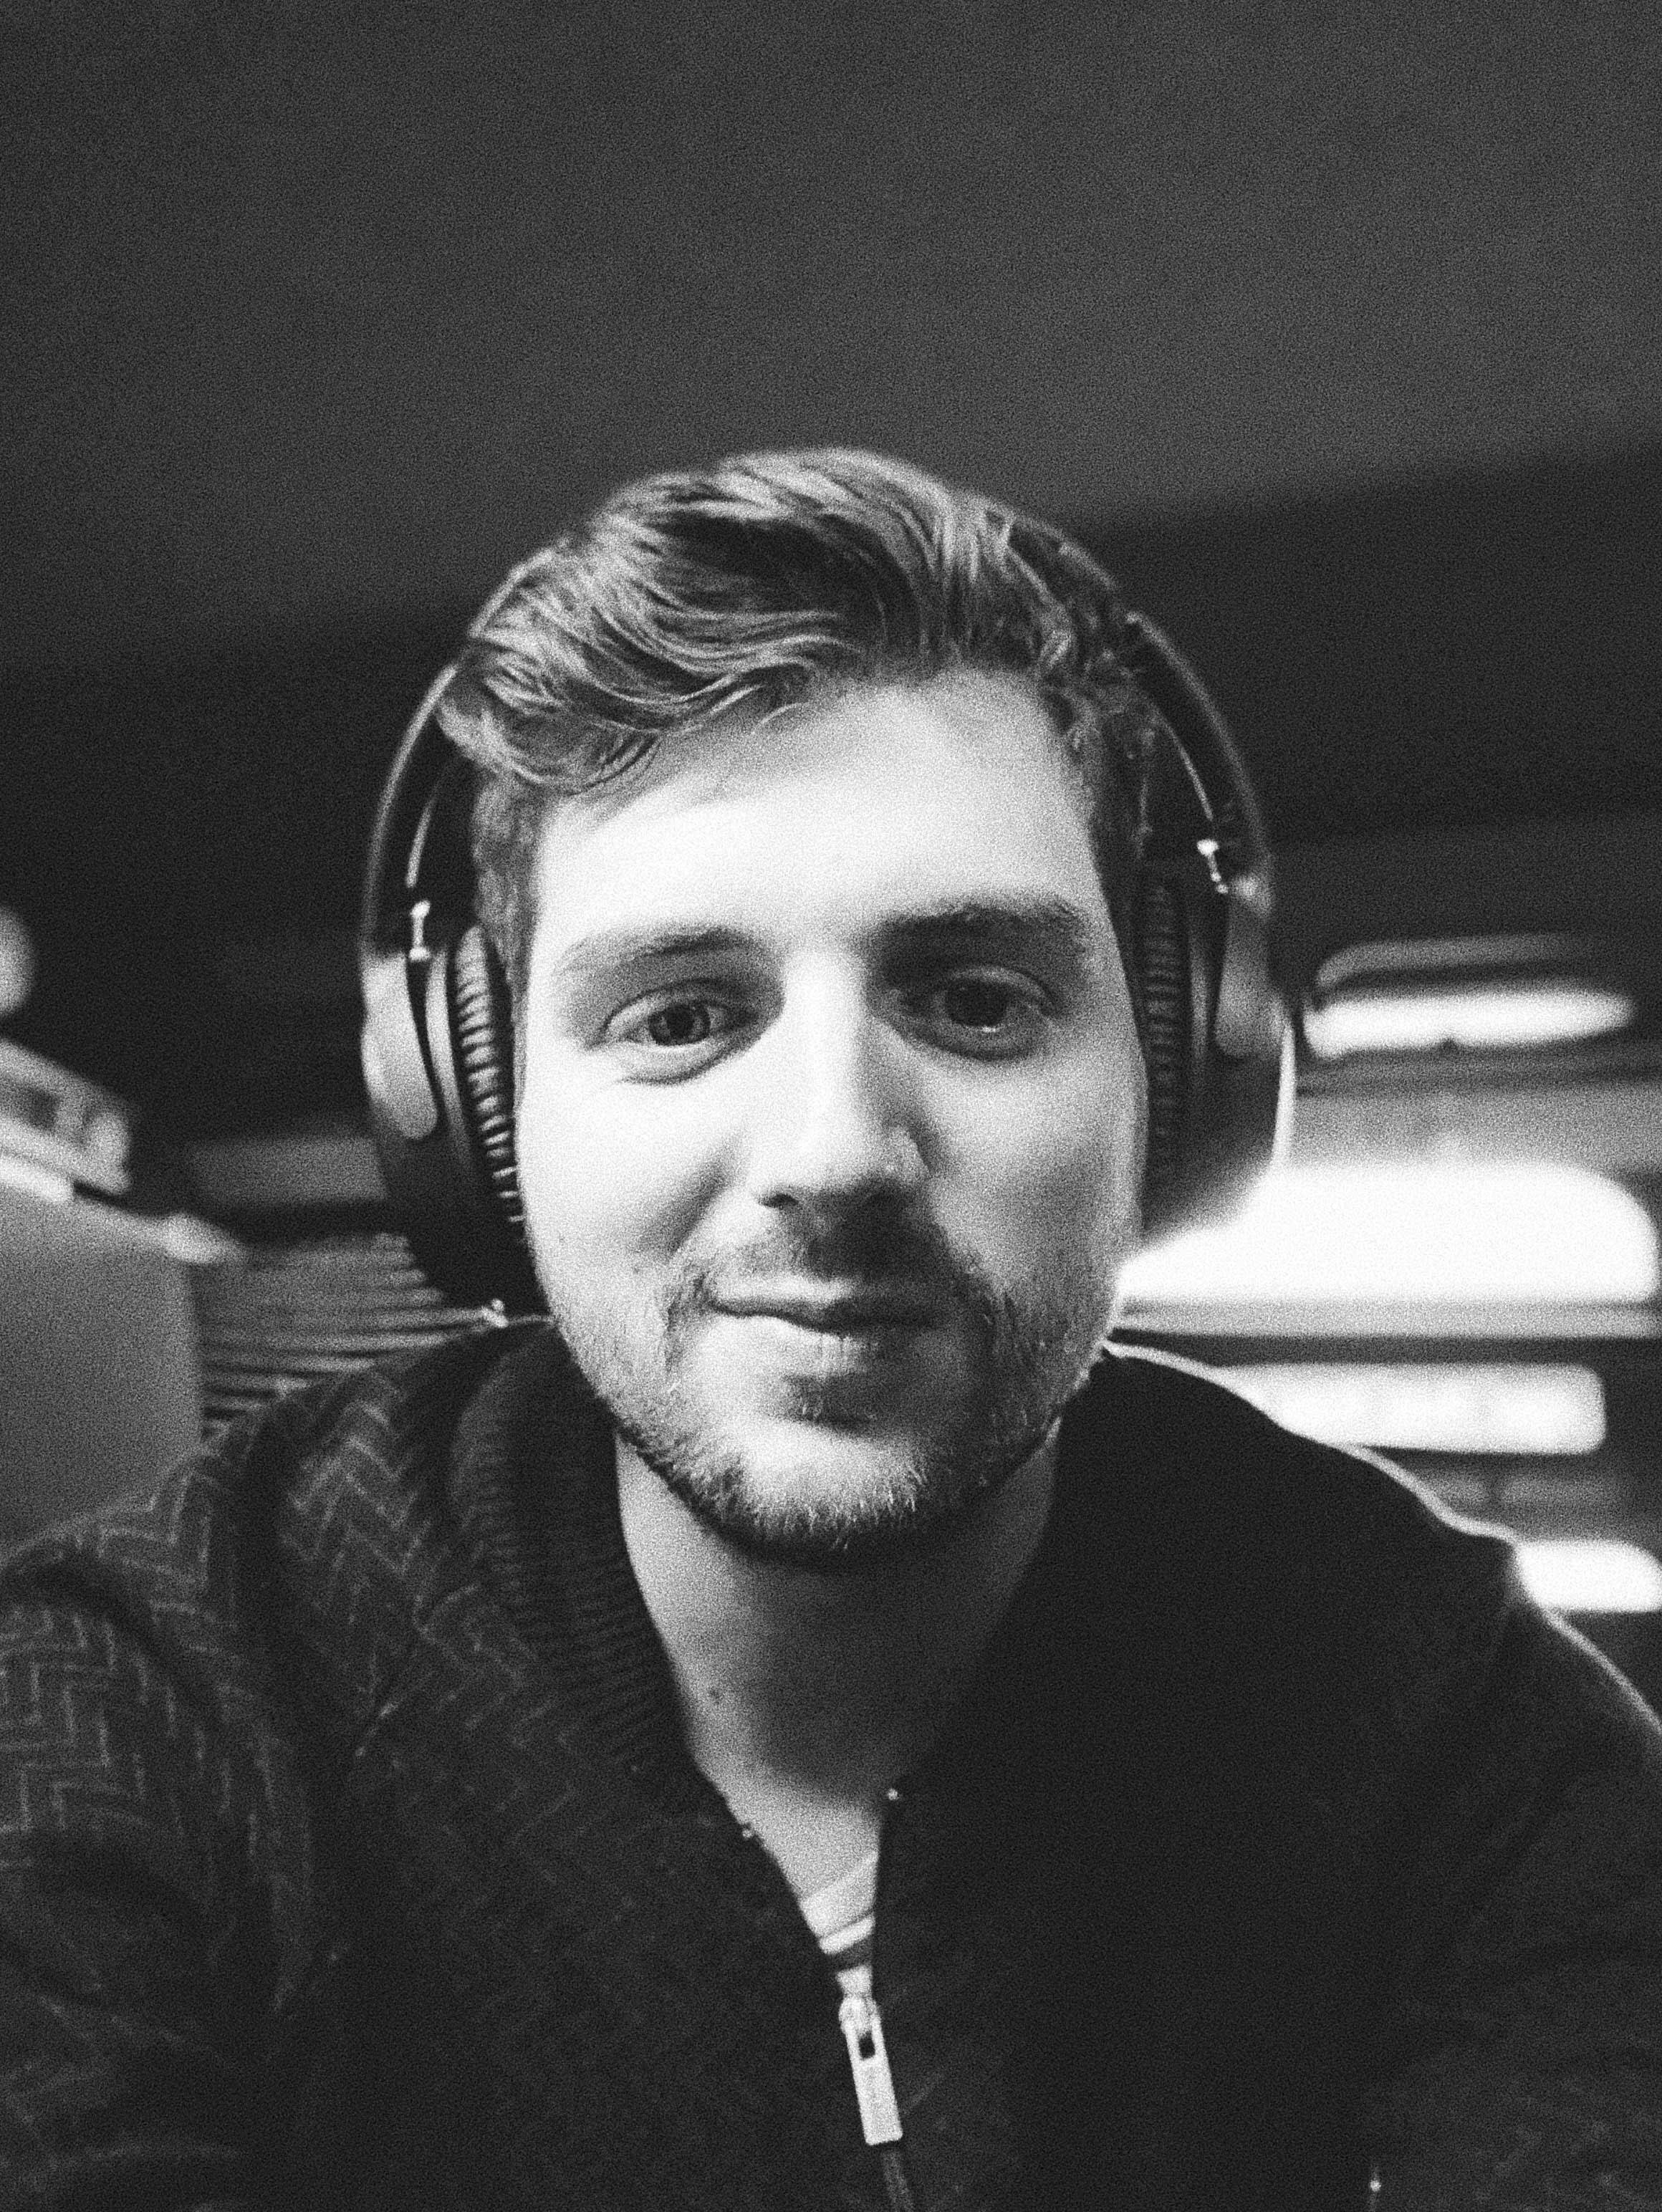 Go to Valentin Chrétien's profile